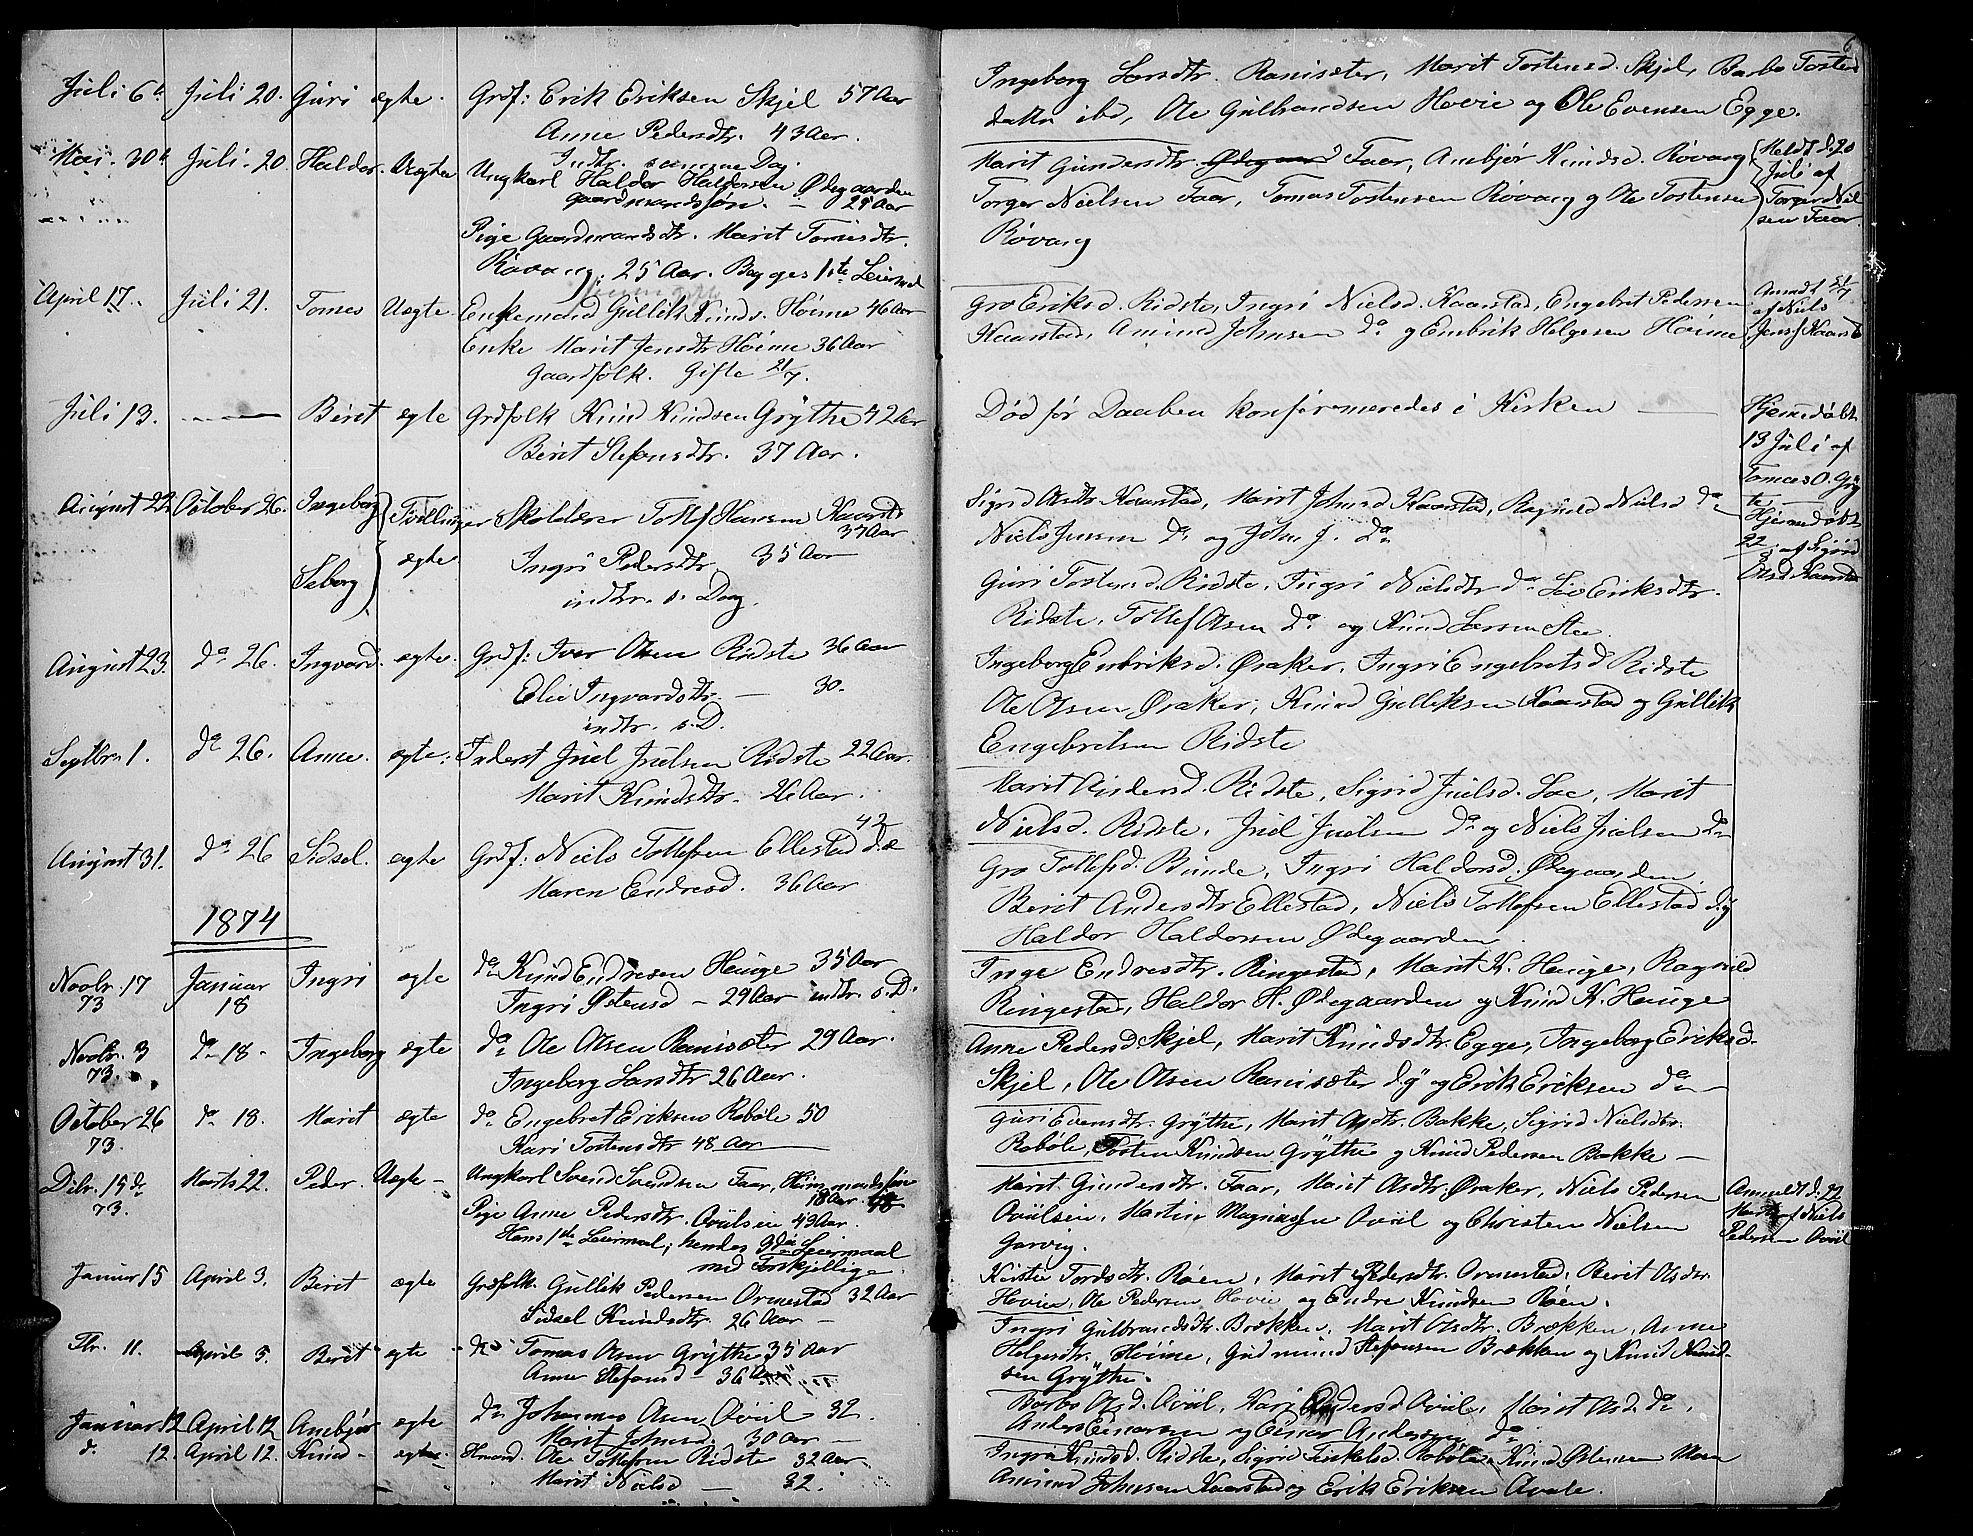 SAH, Vestre Slidre prestekontor, Klokkerbok nr. 2, 1869-1882, s. 6